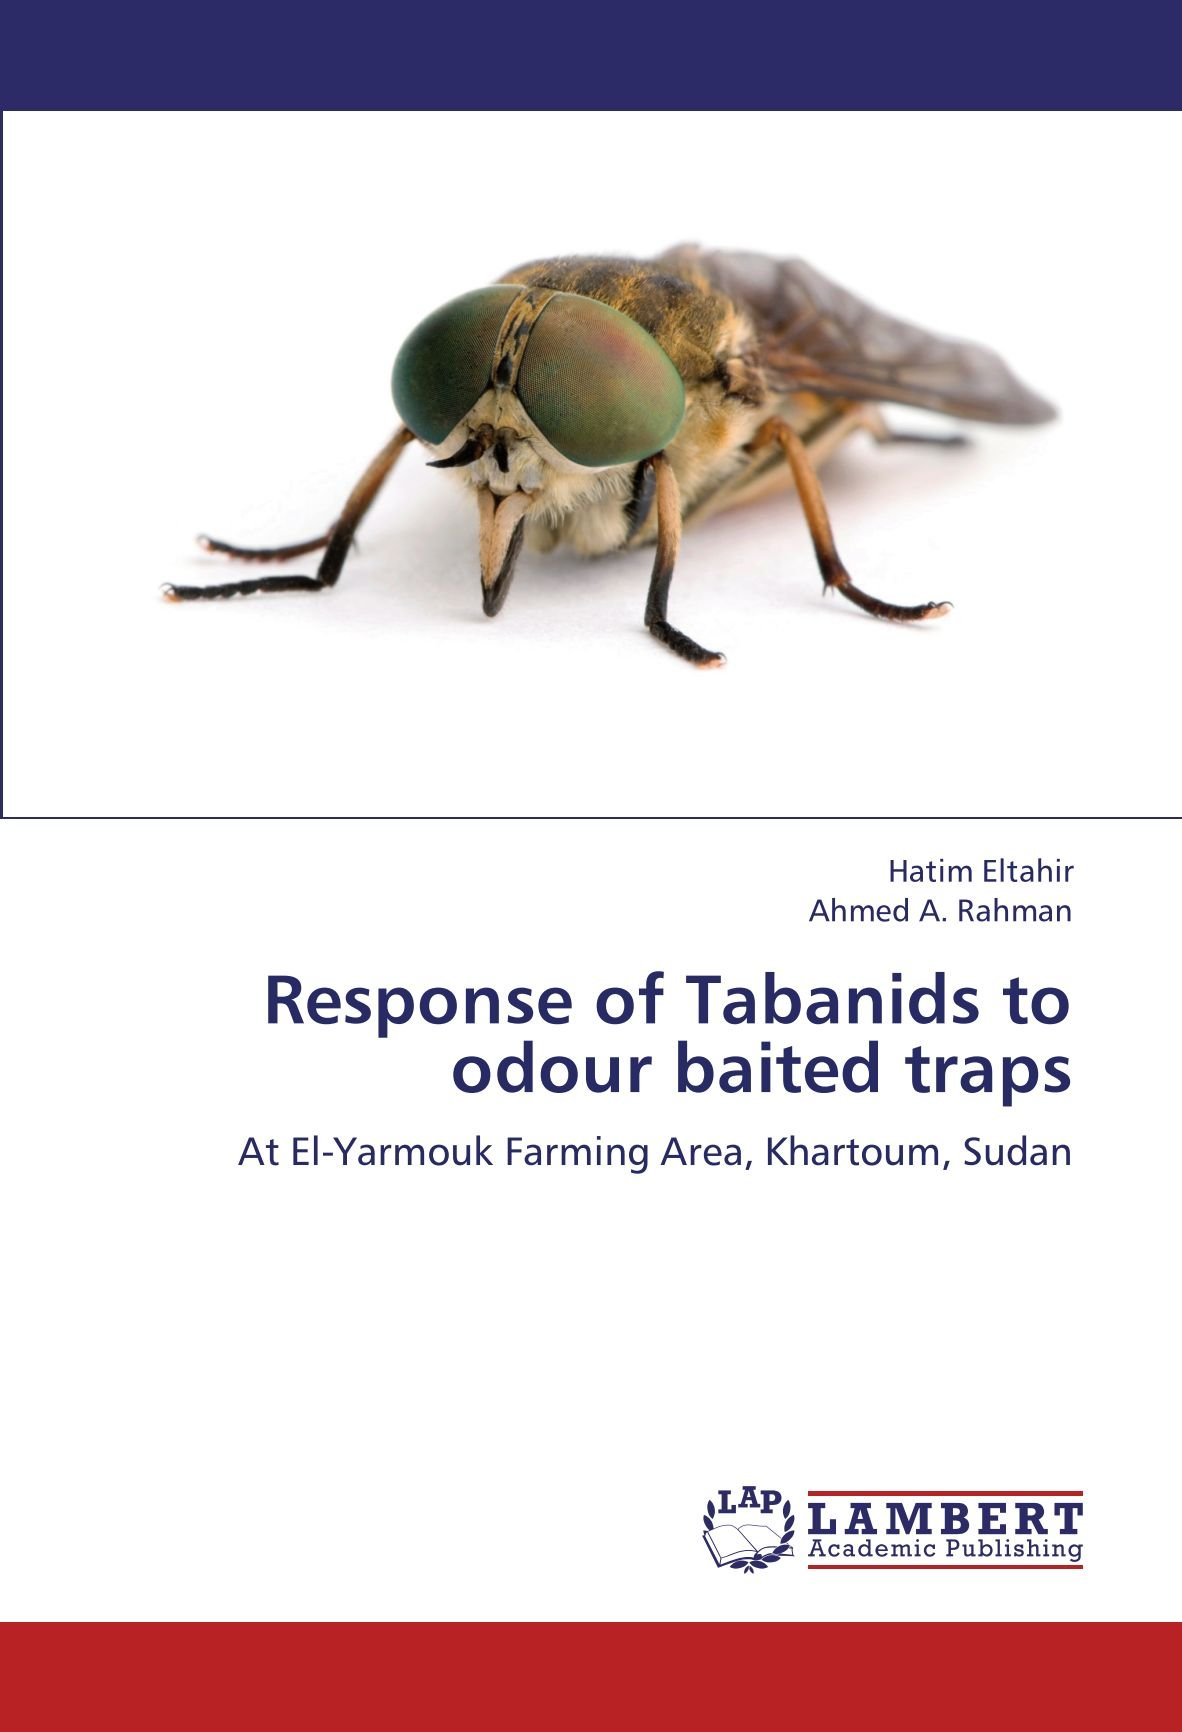 Response of Tabanids to odour baited traps: At El-Yarmouk Farming